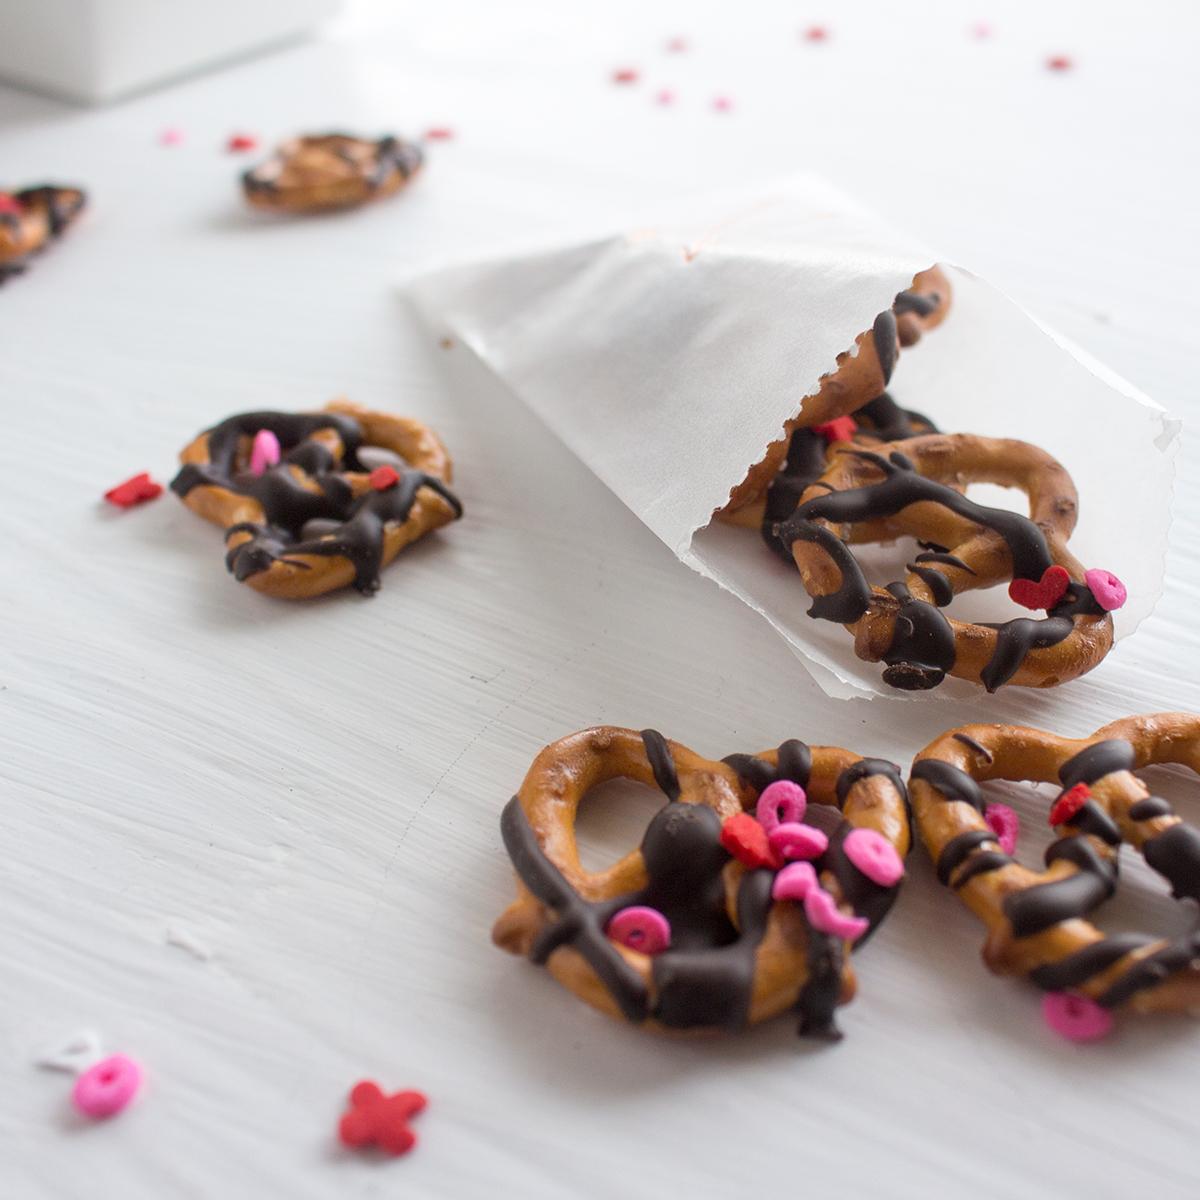 glassine-bags-valentines-pretzels